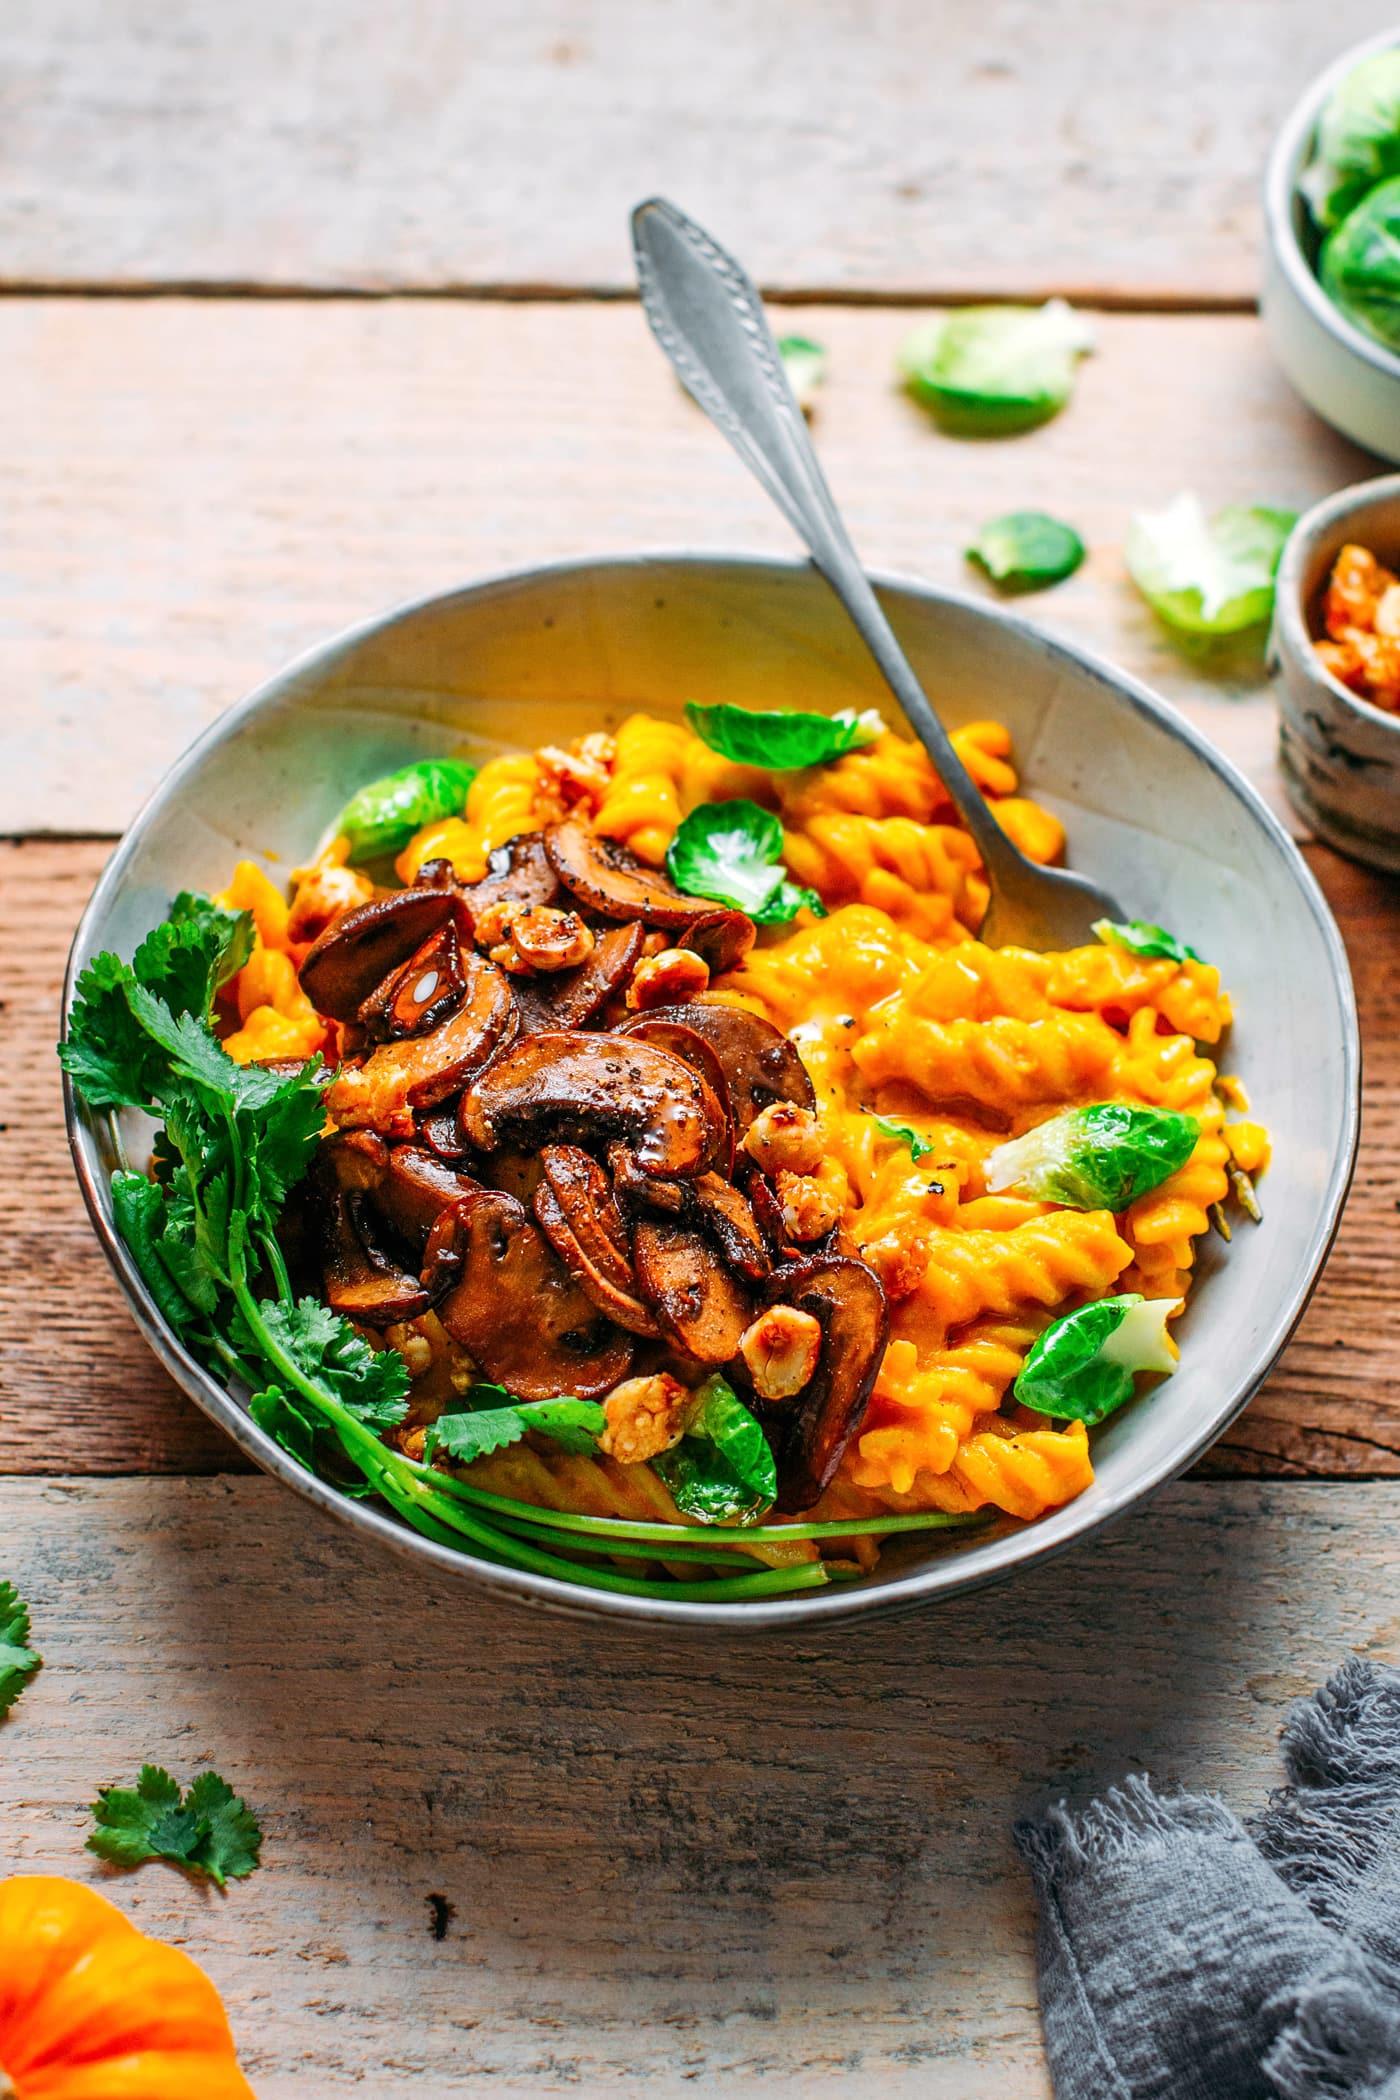 Creamy Pumpkin Pasta with Caramelized Hazelnut Mushrooms